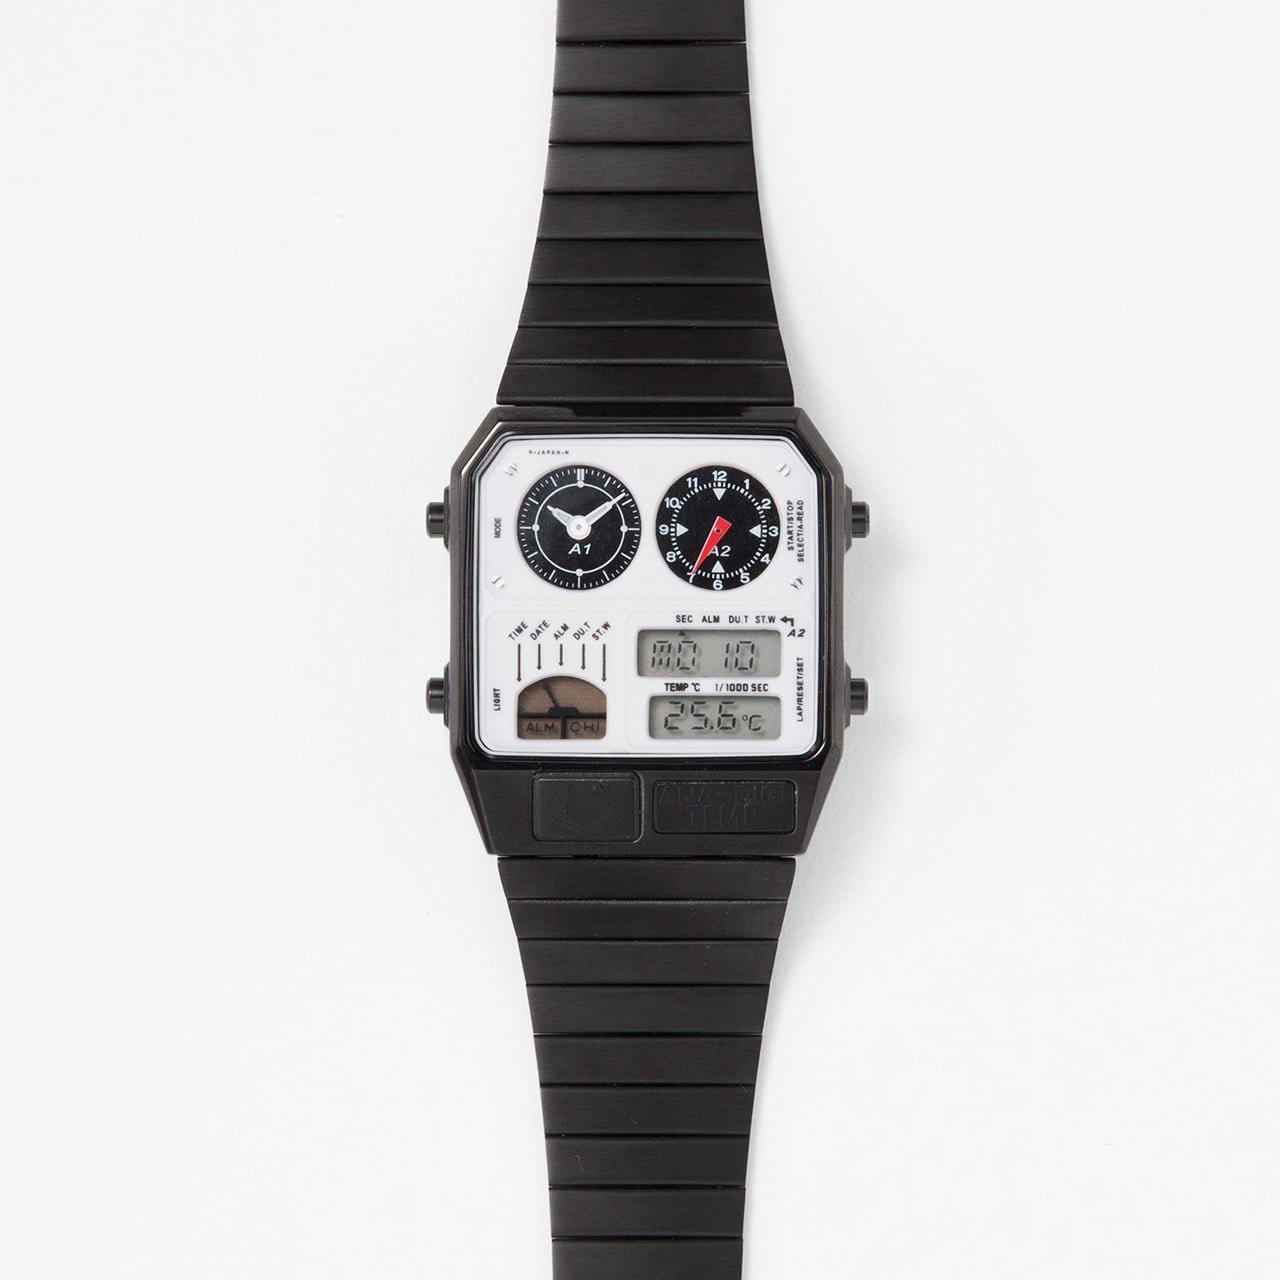 # ANA-DIGI TEMP for FRED PERRY 復刻經典星辰錶:復古與時尚的絕佳聯名 3